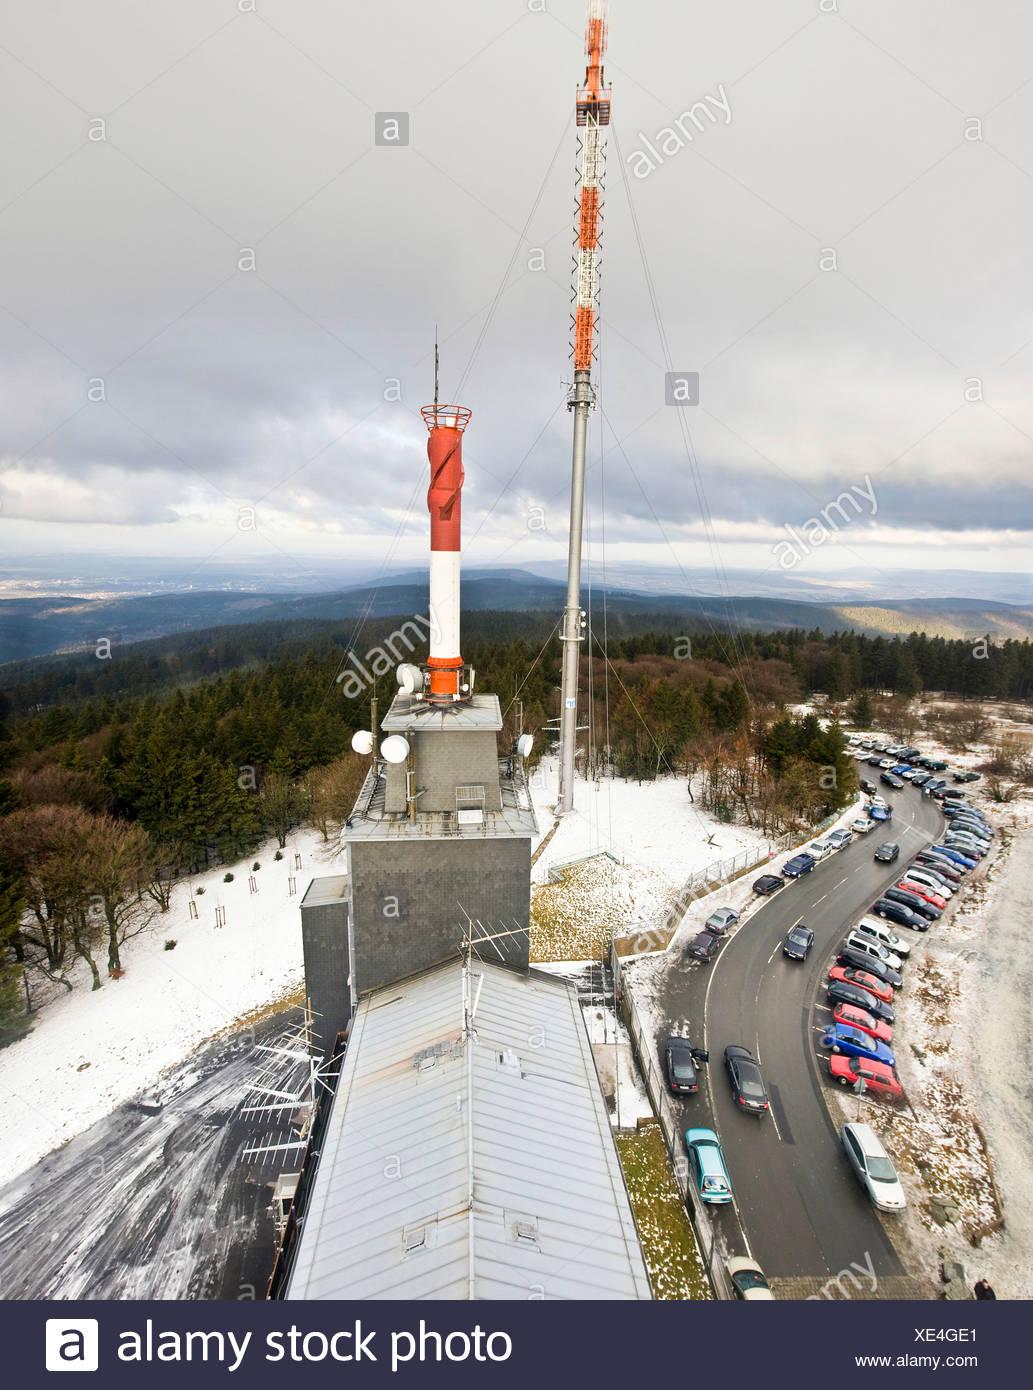 HR radio station's radio masts on Mt  Feldberg with a view